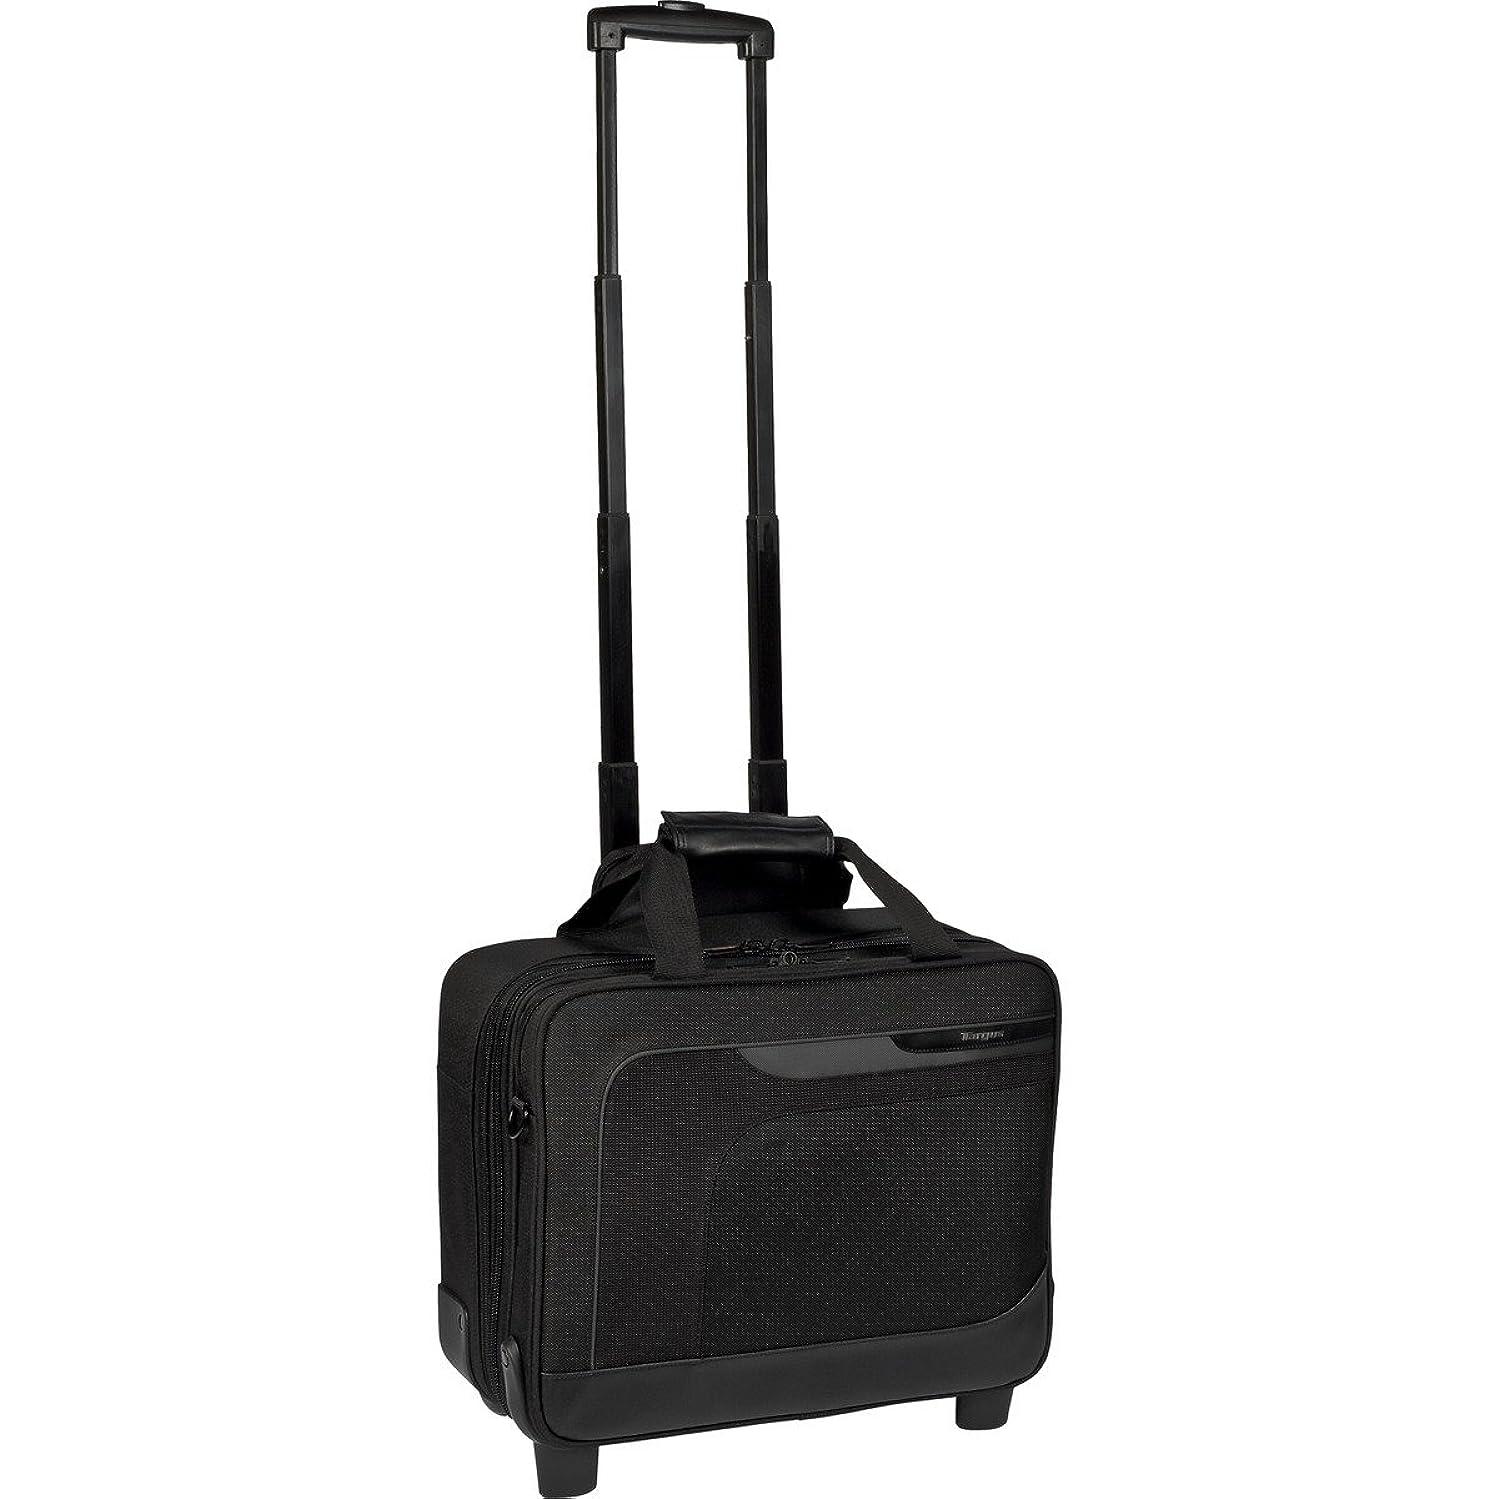 Targus Checkpoint-Friendly Mobile Elite Roller for 15.6 Inch Widescreen Laptops TBR006US (Black)